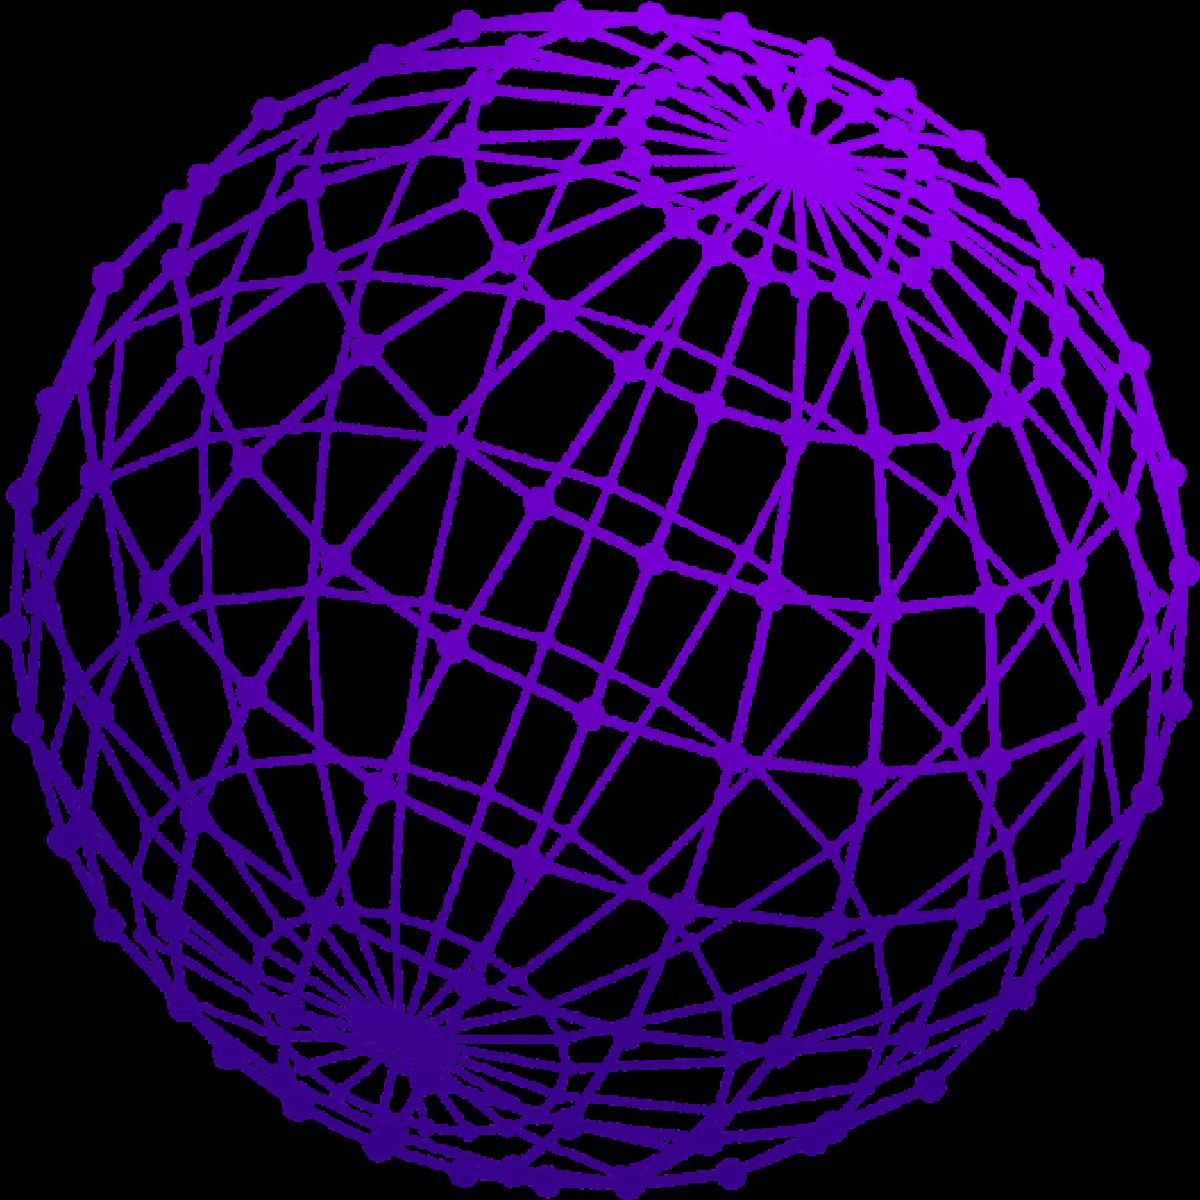 https://cybernetips.com/wp-content/uploads/2019/05/Accenture-World-Network-1200x1200.png